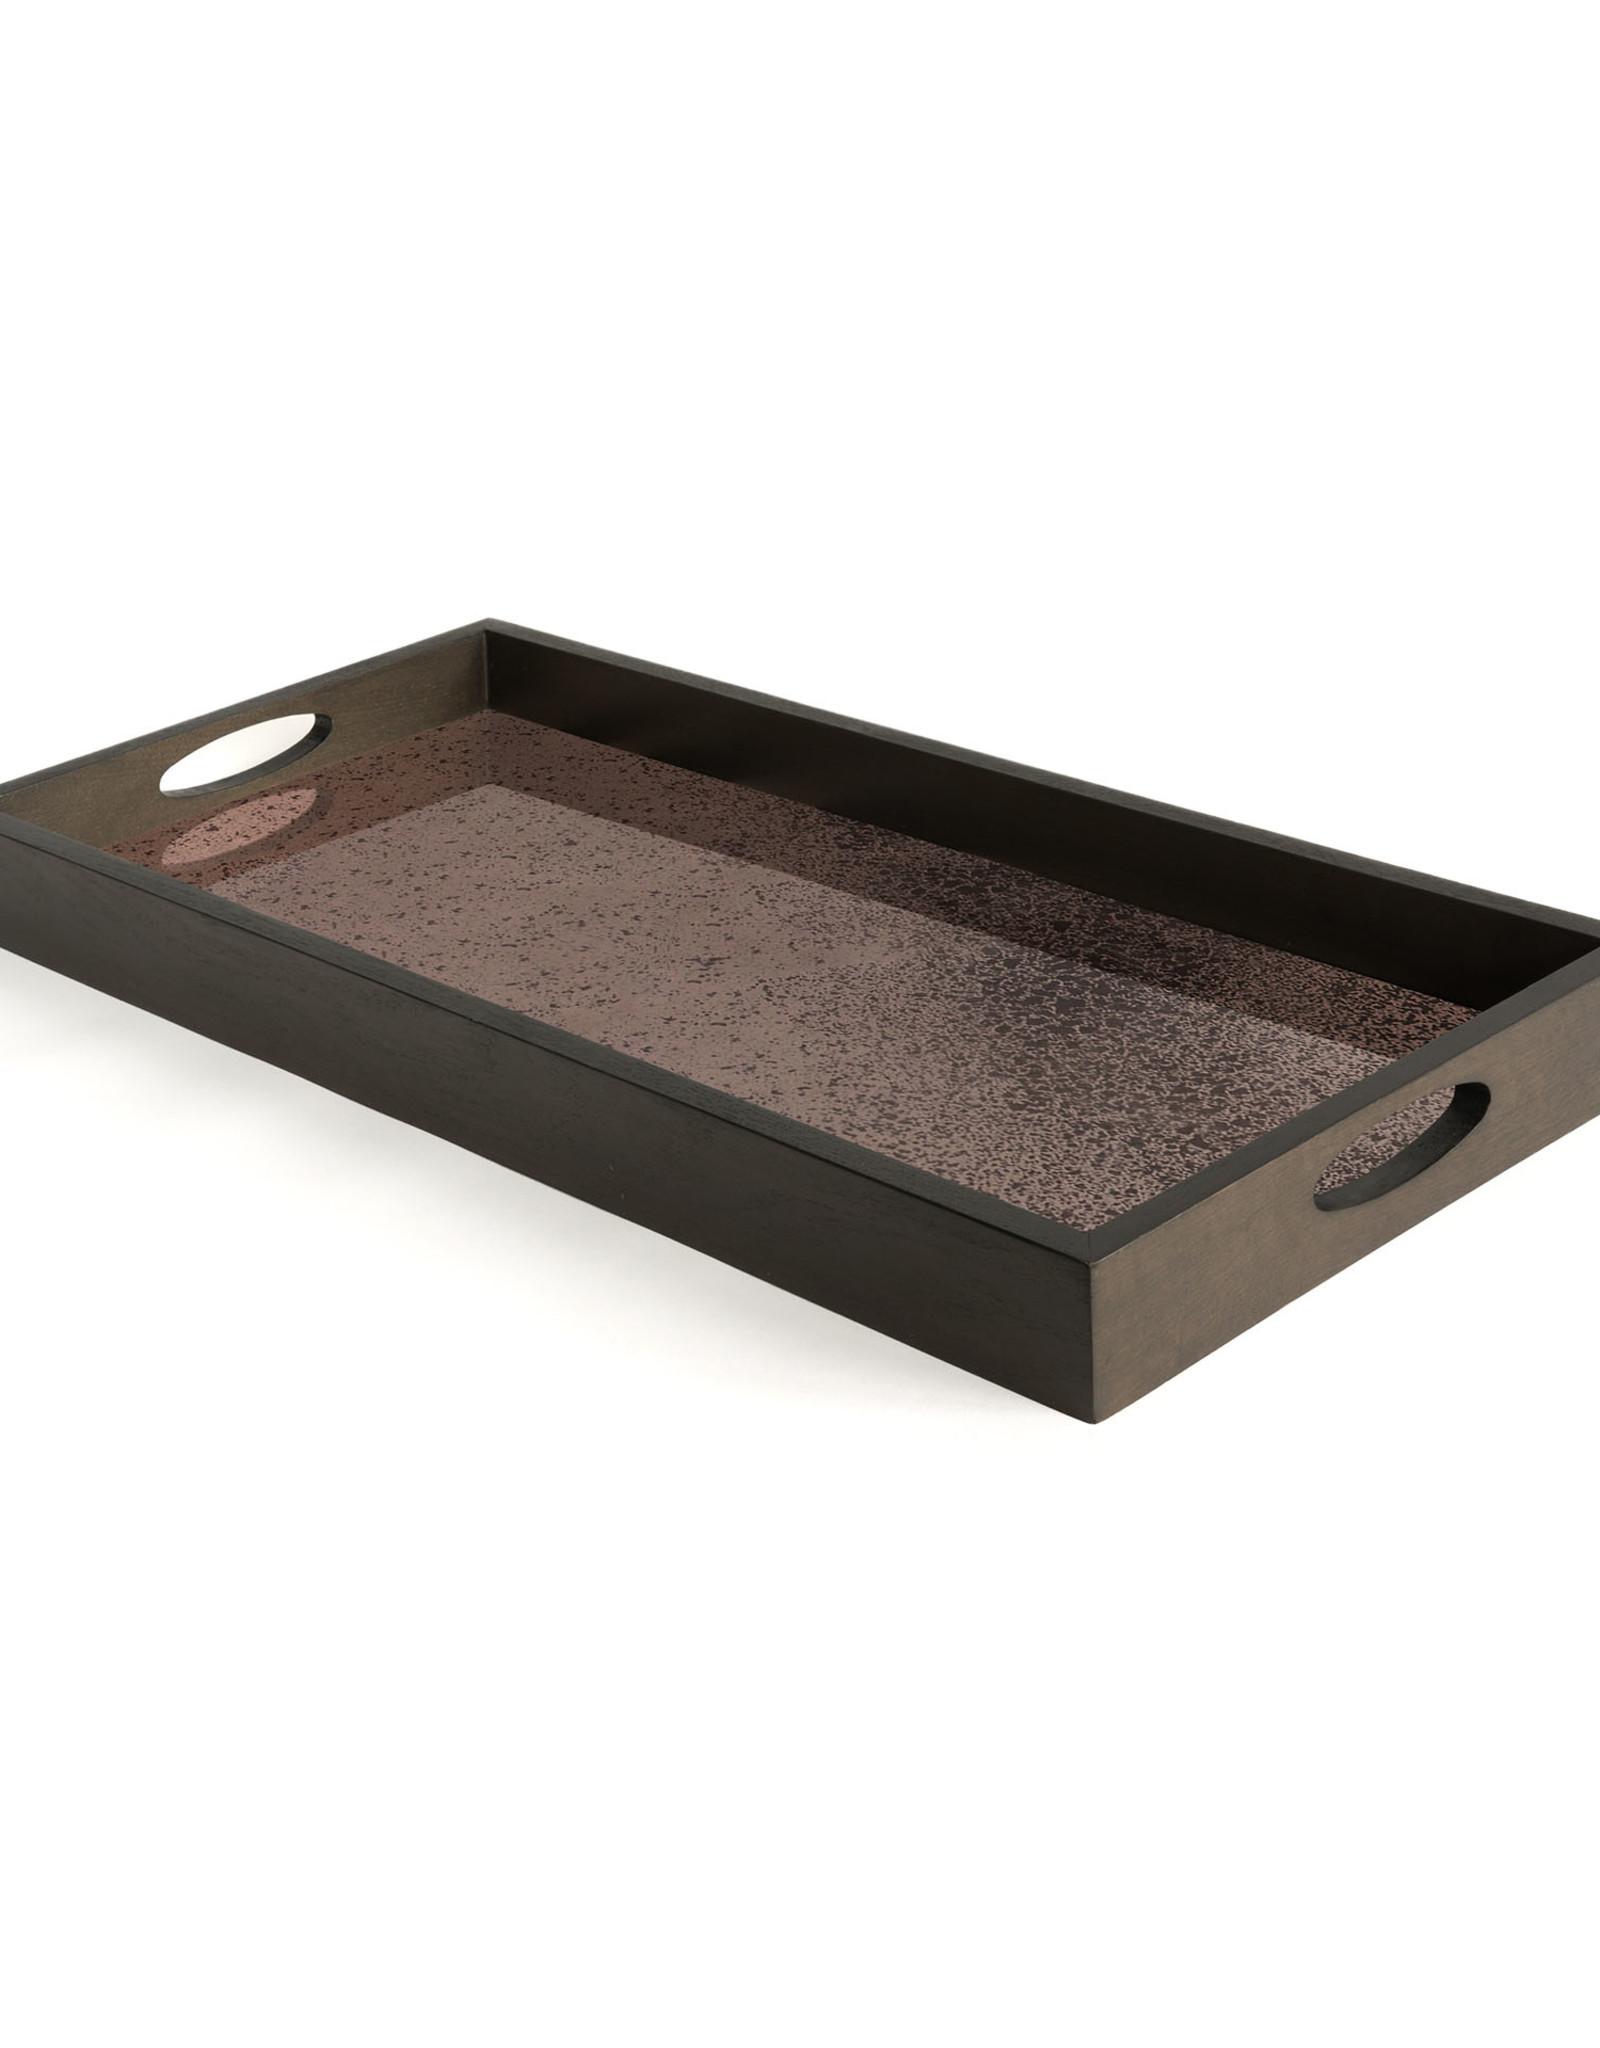 Bronze mirror tray - rectangular - M 27 x 12 x 2